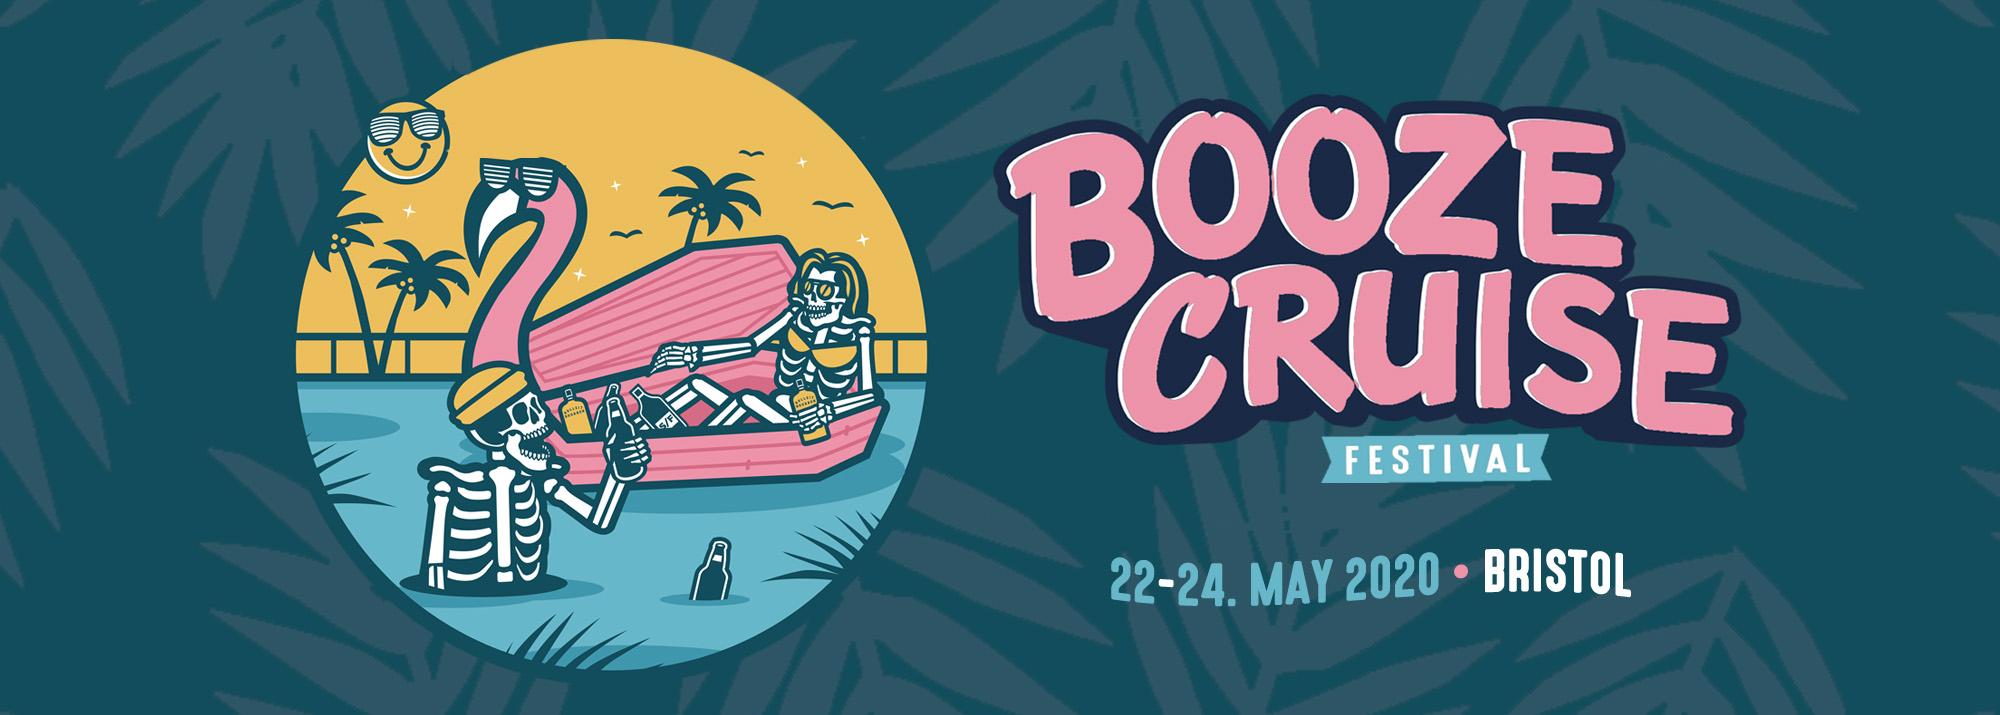 Bristol Booze Cruise